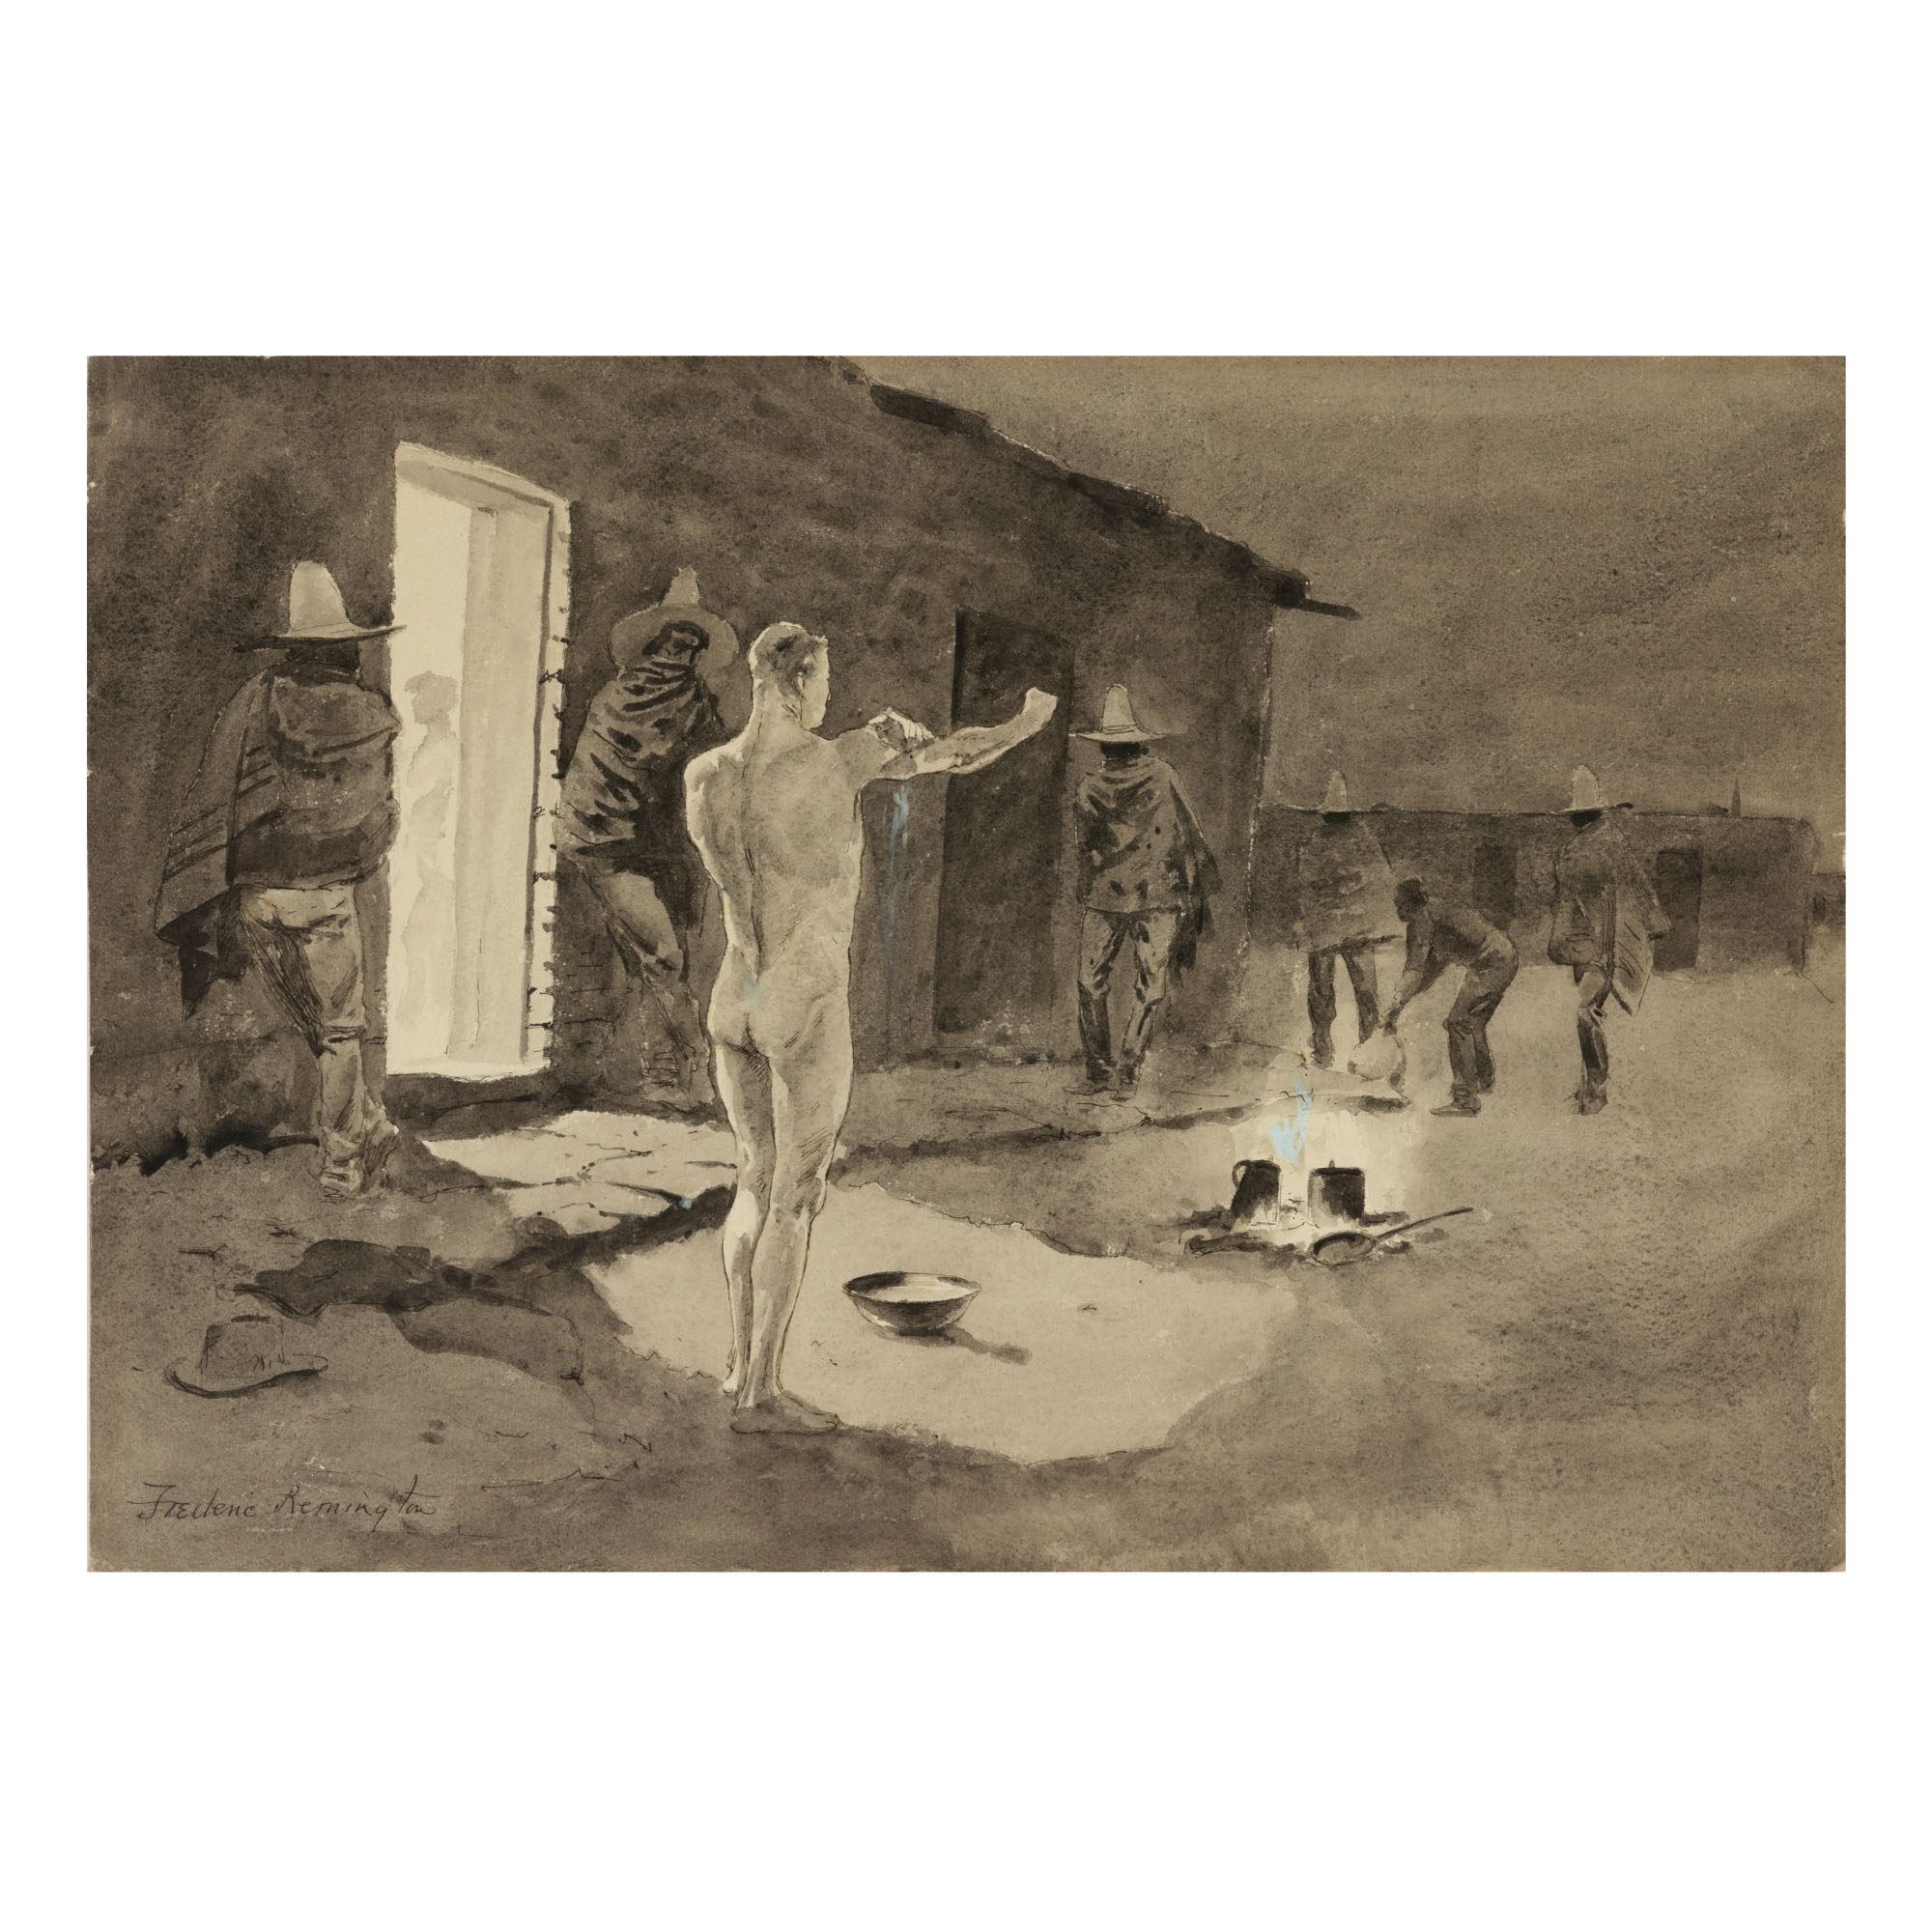 FREDERIC REMINGTON | AN EARLY MORNING BATH (A CURIOUS CUSTOM IN MEXICO)